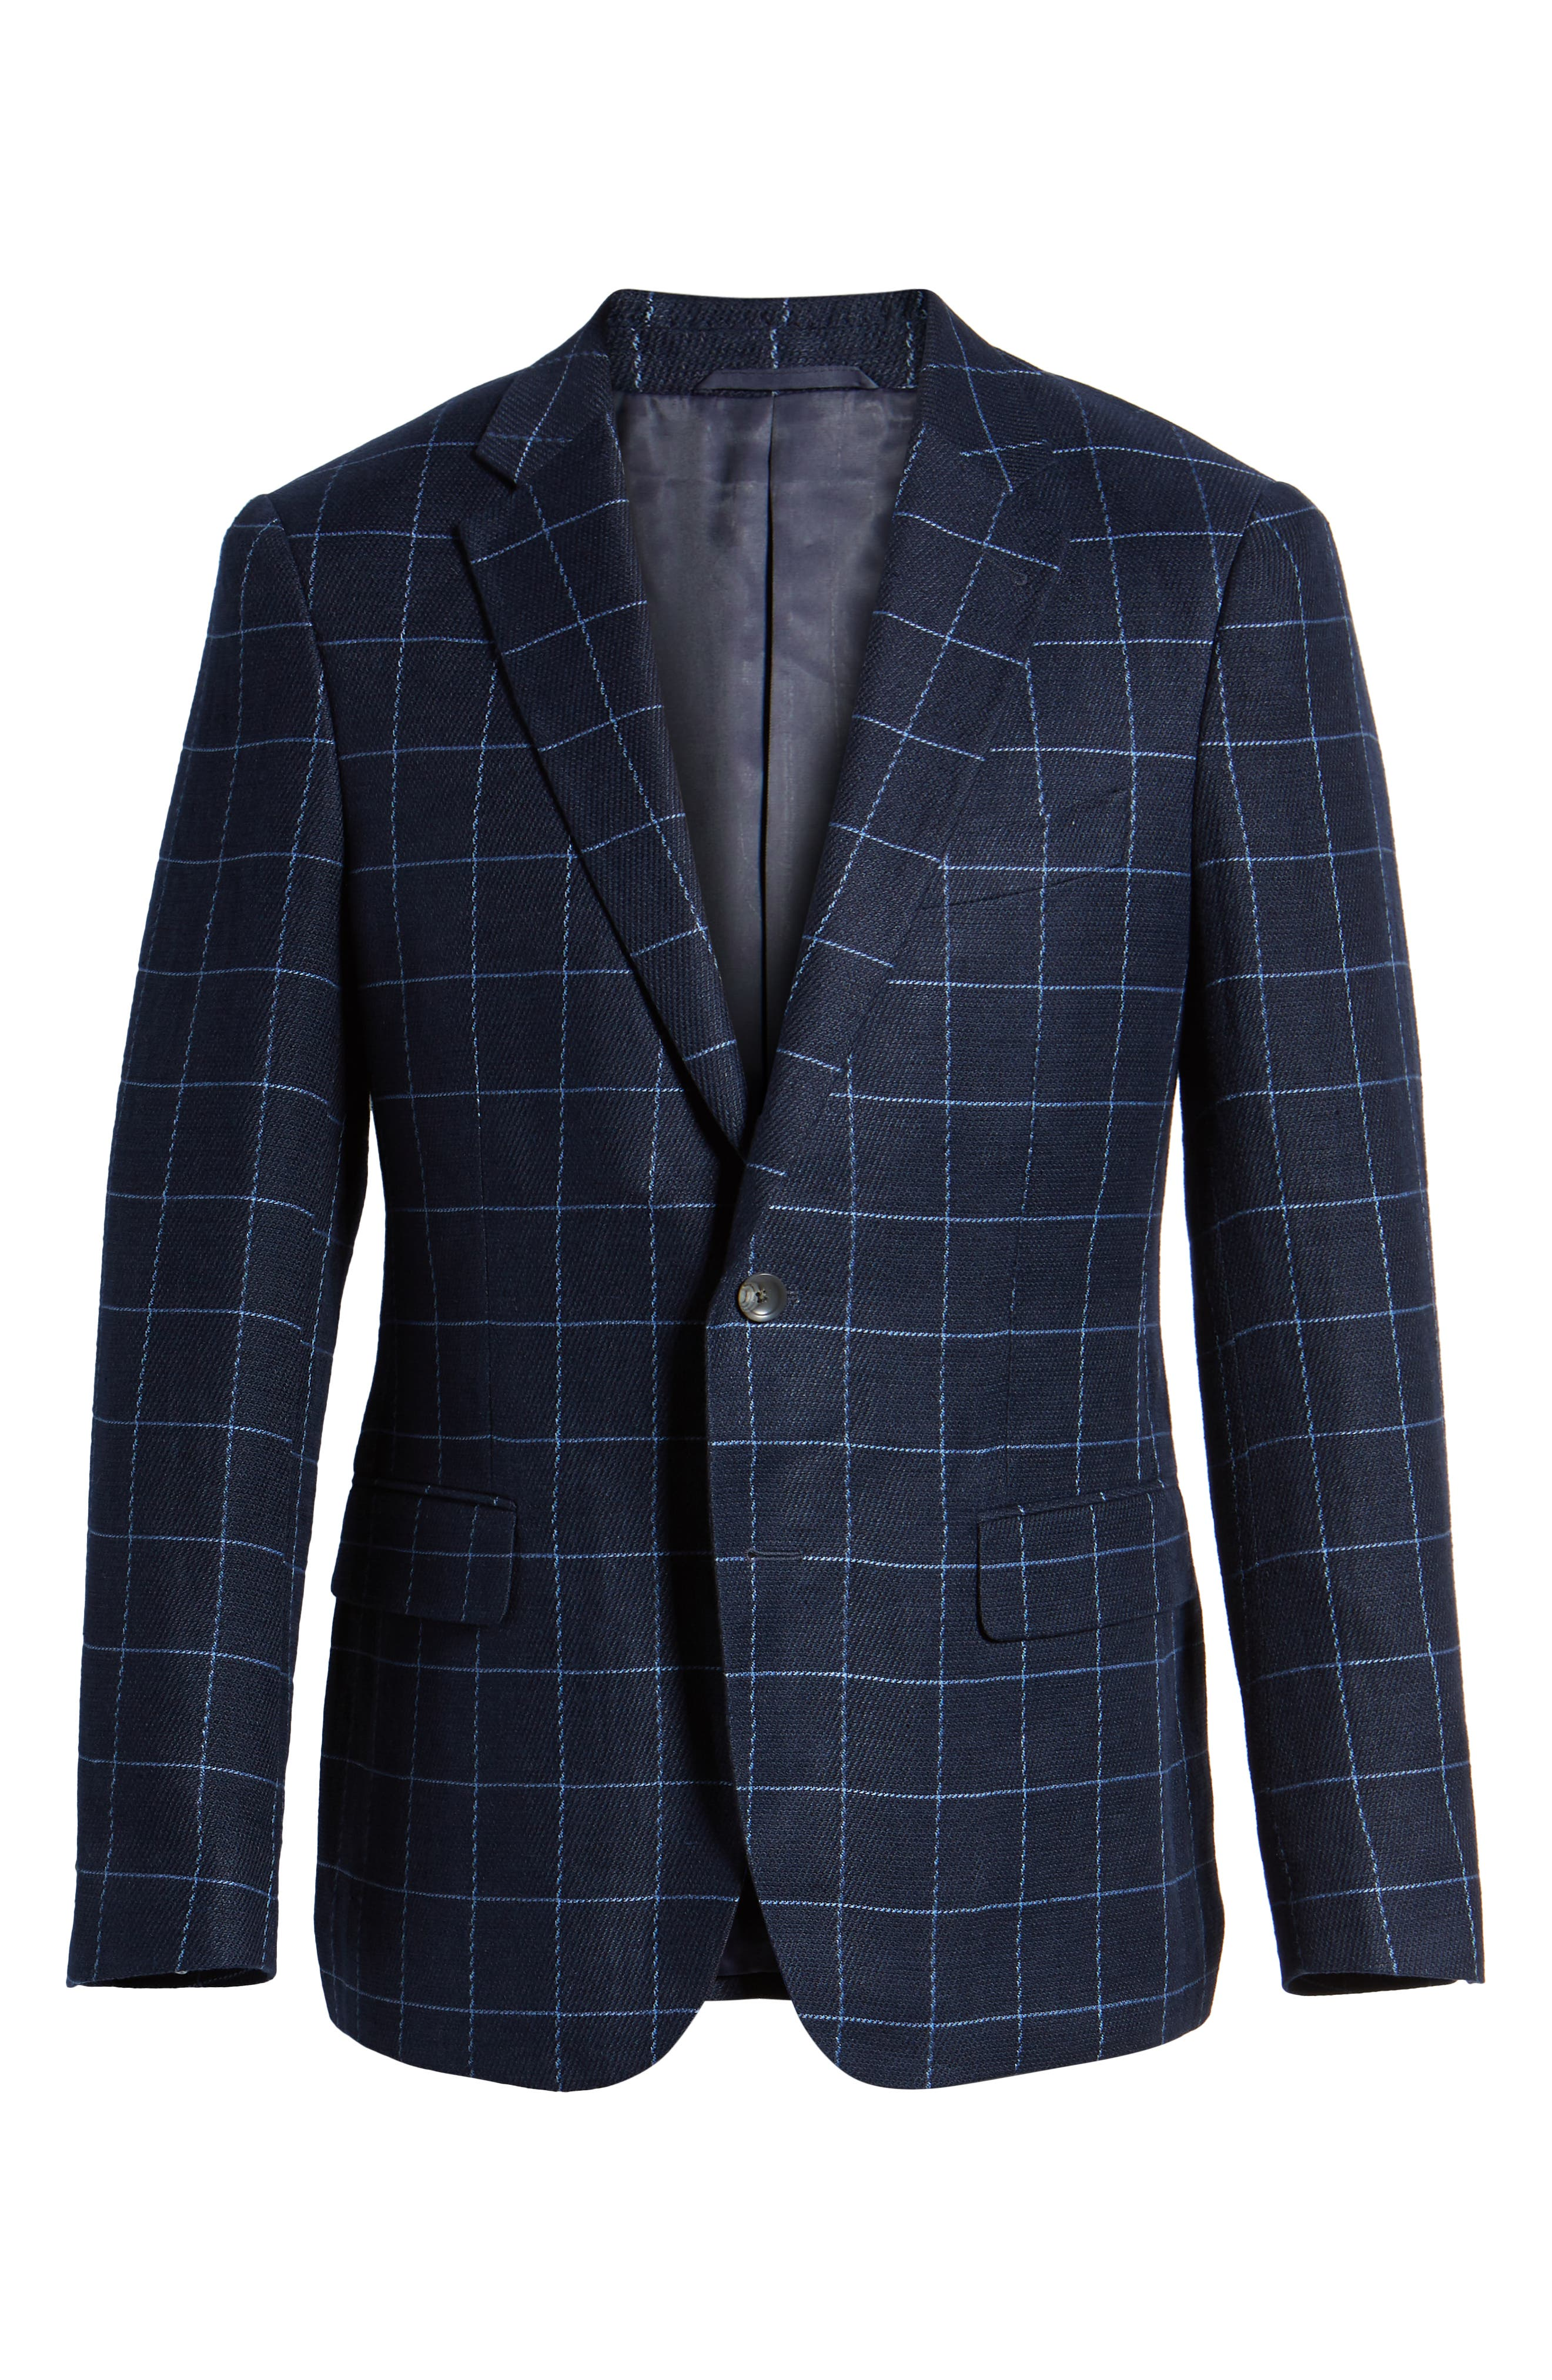 Underwood Regular Fit Sport Coat,                             Alternate thumbnail 5, color,                             NAVY